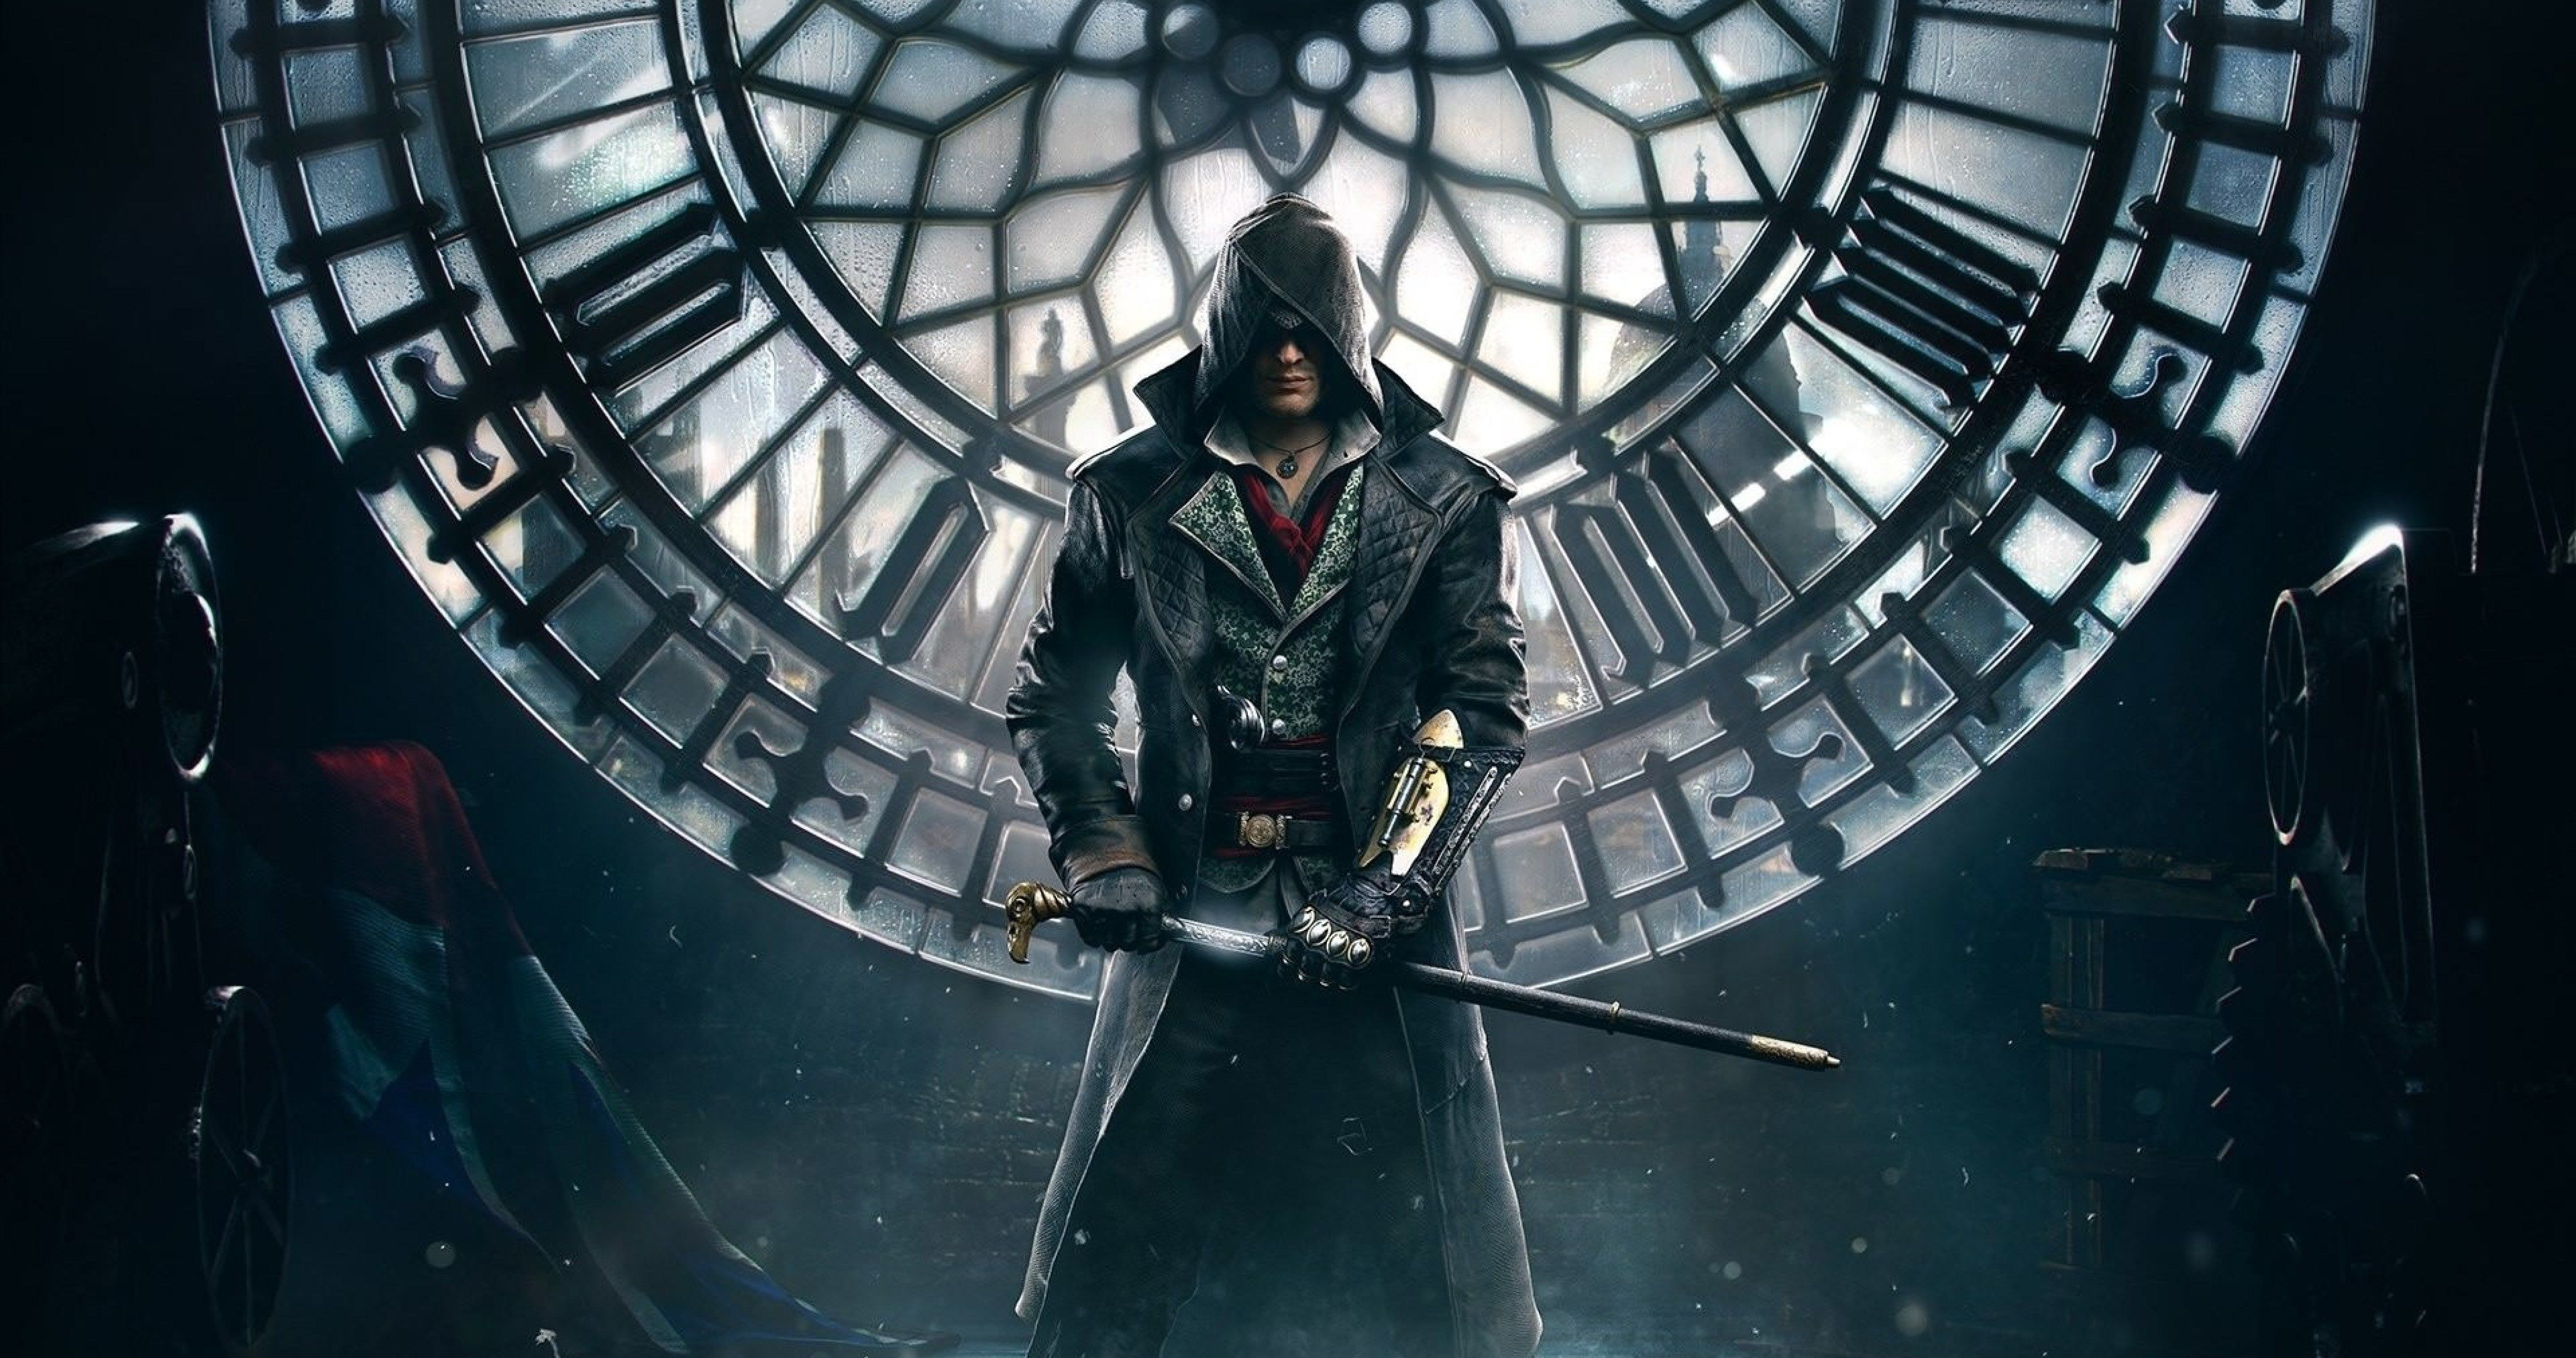 Assassins Creed Syndicate 4k Ultra Hd Wallpaper Ololoshenka